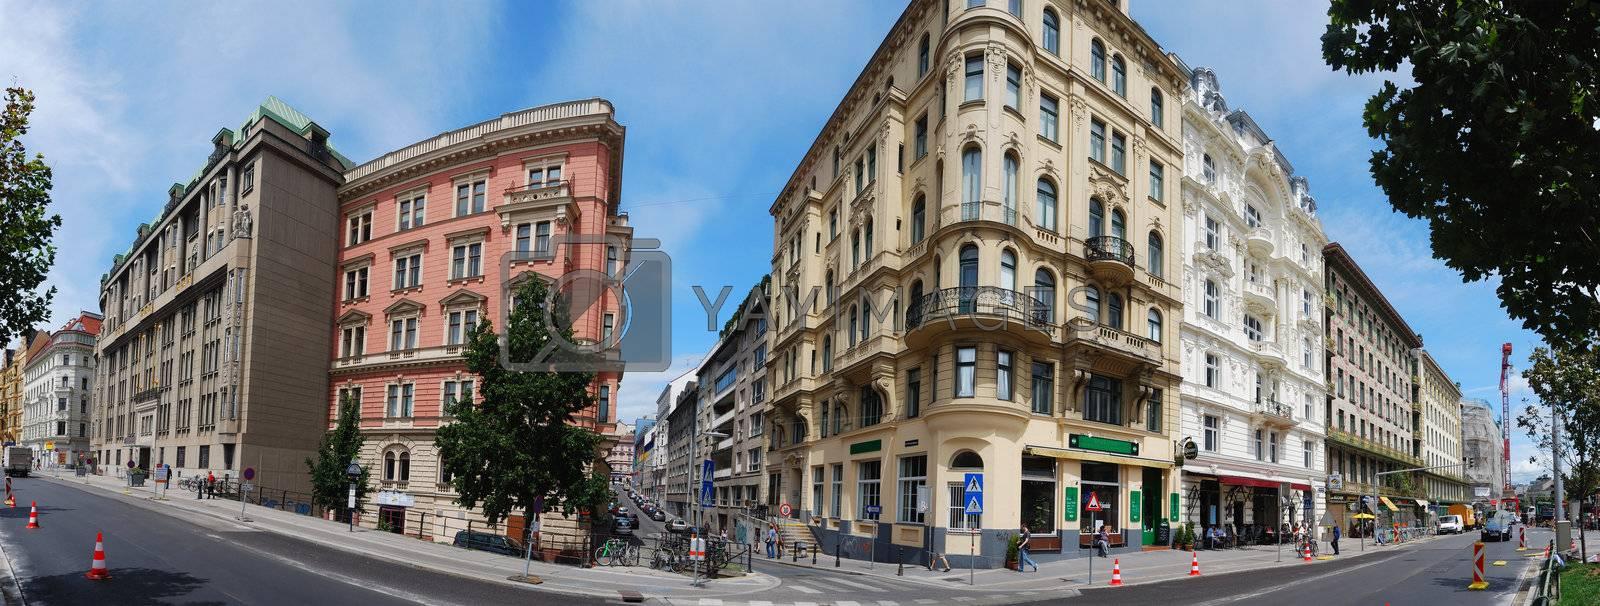 vienna row house complete panorama in Vienna Austria